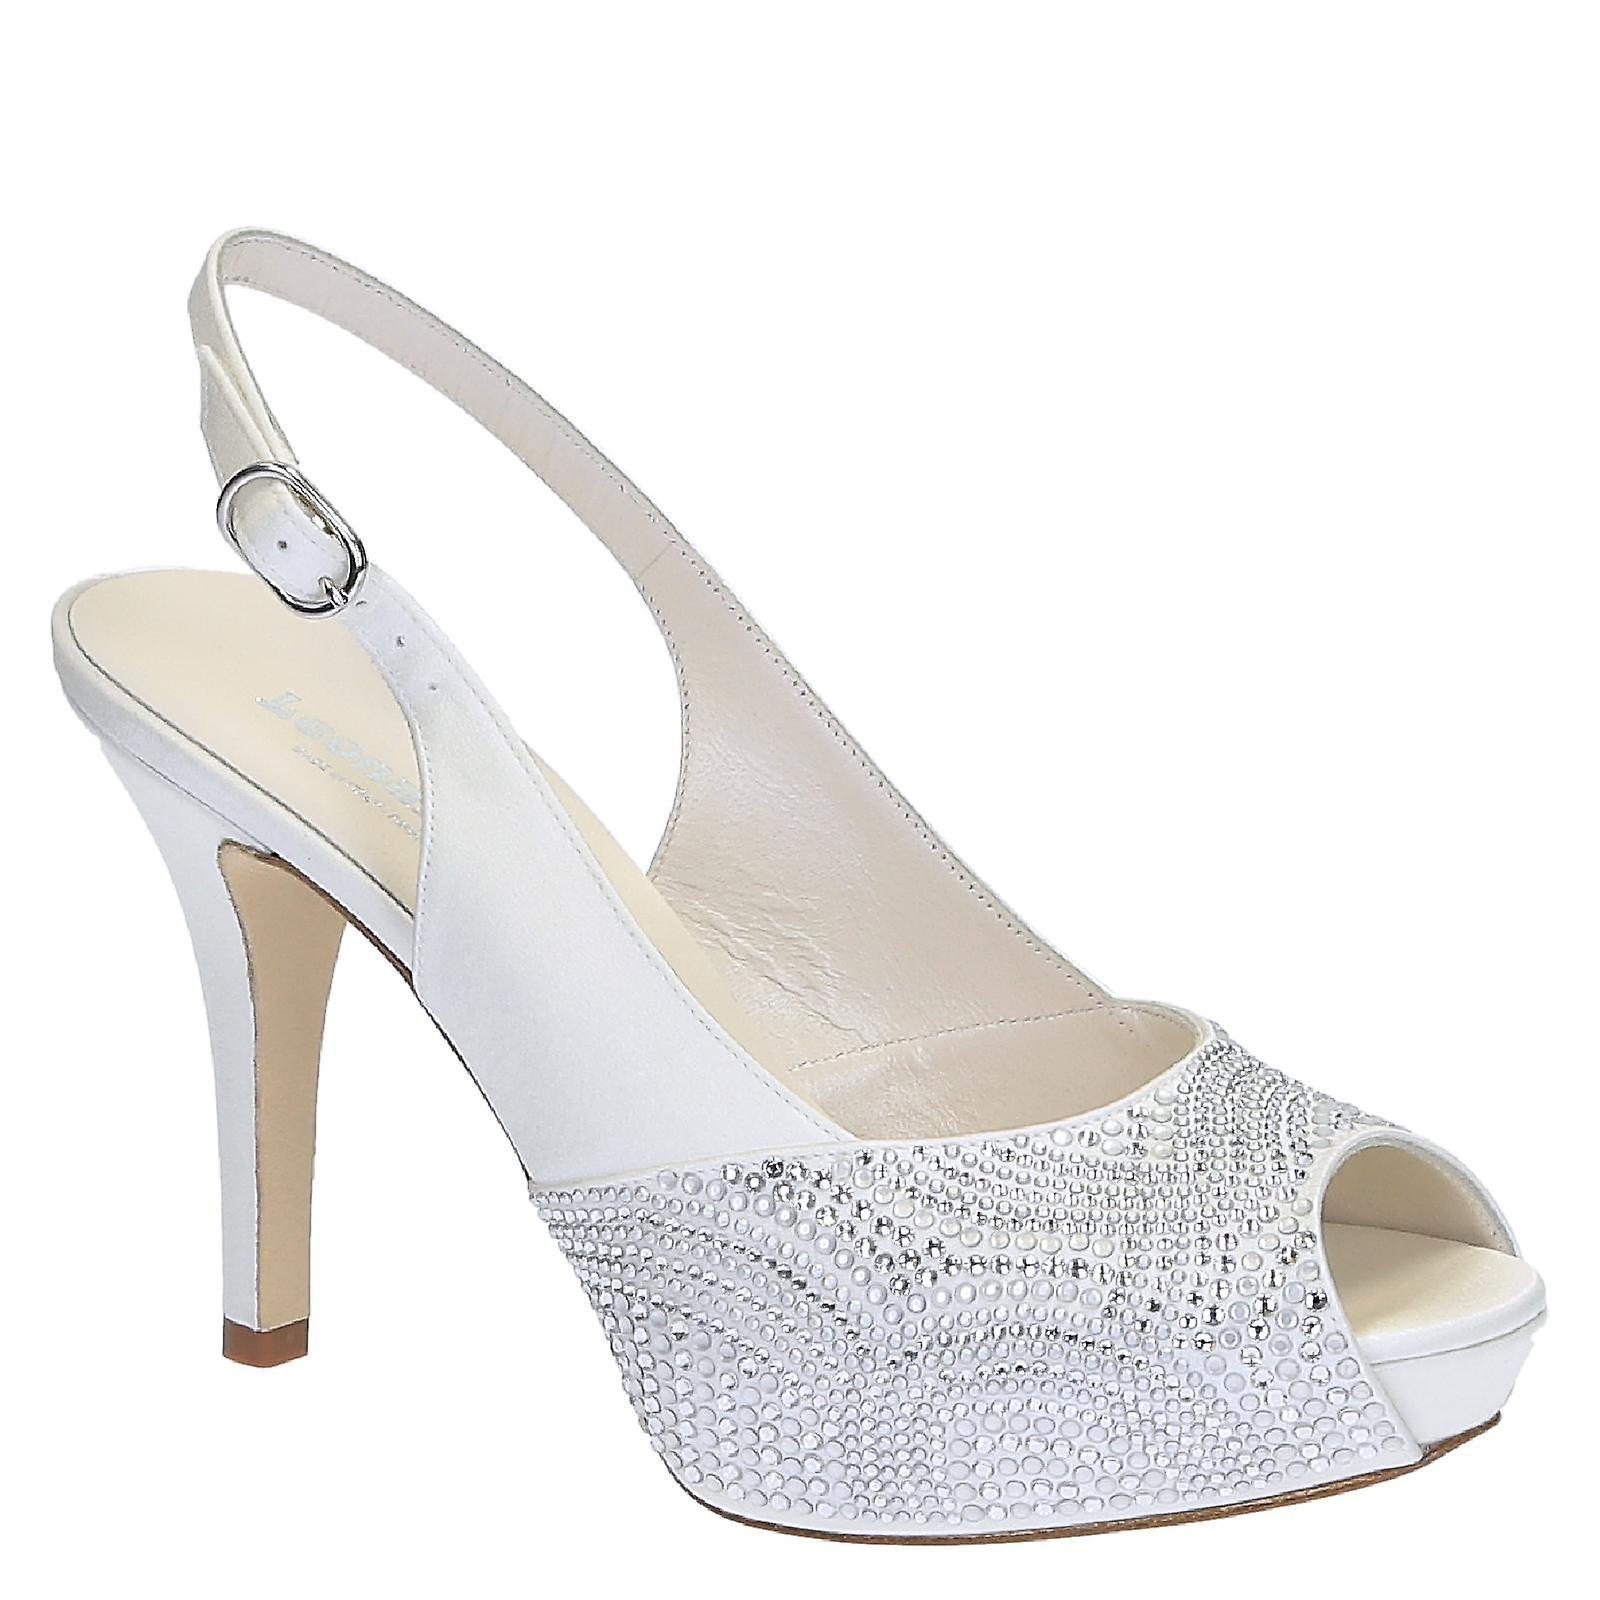 Slingback open toe bride platform sandals in white satin i1StU